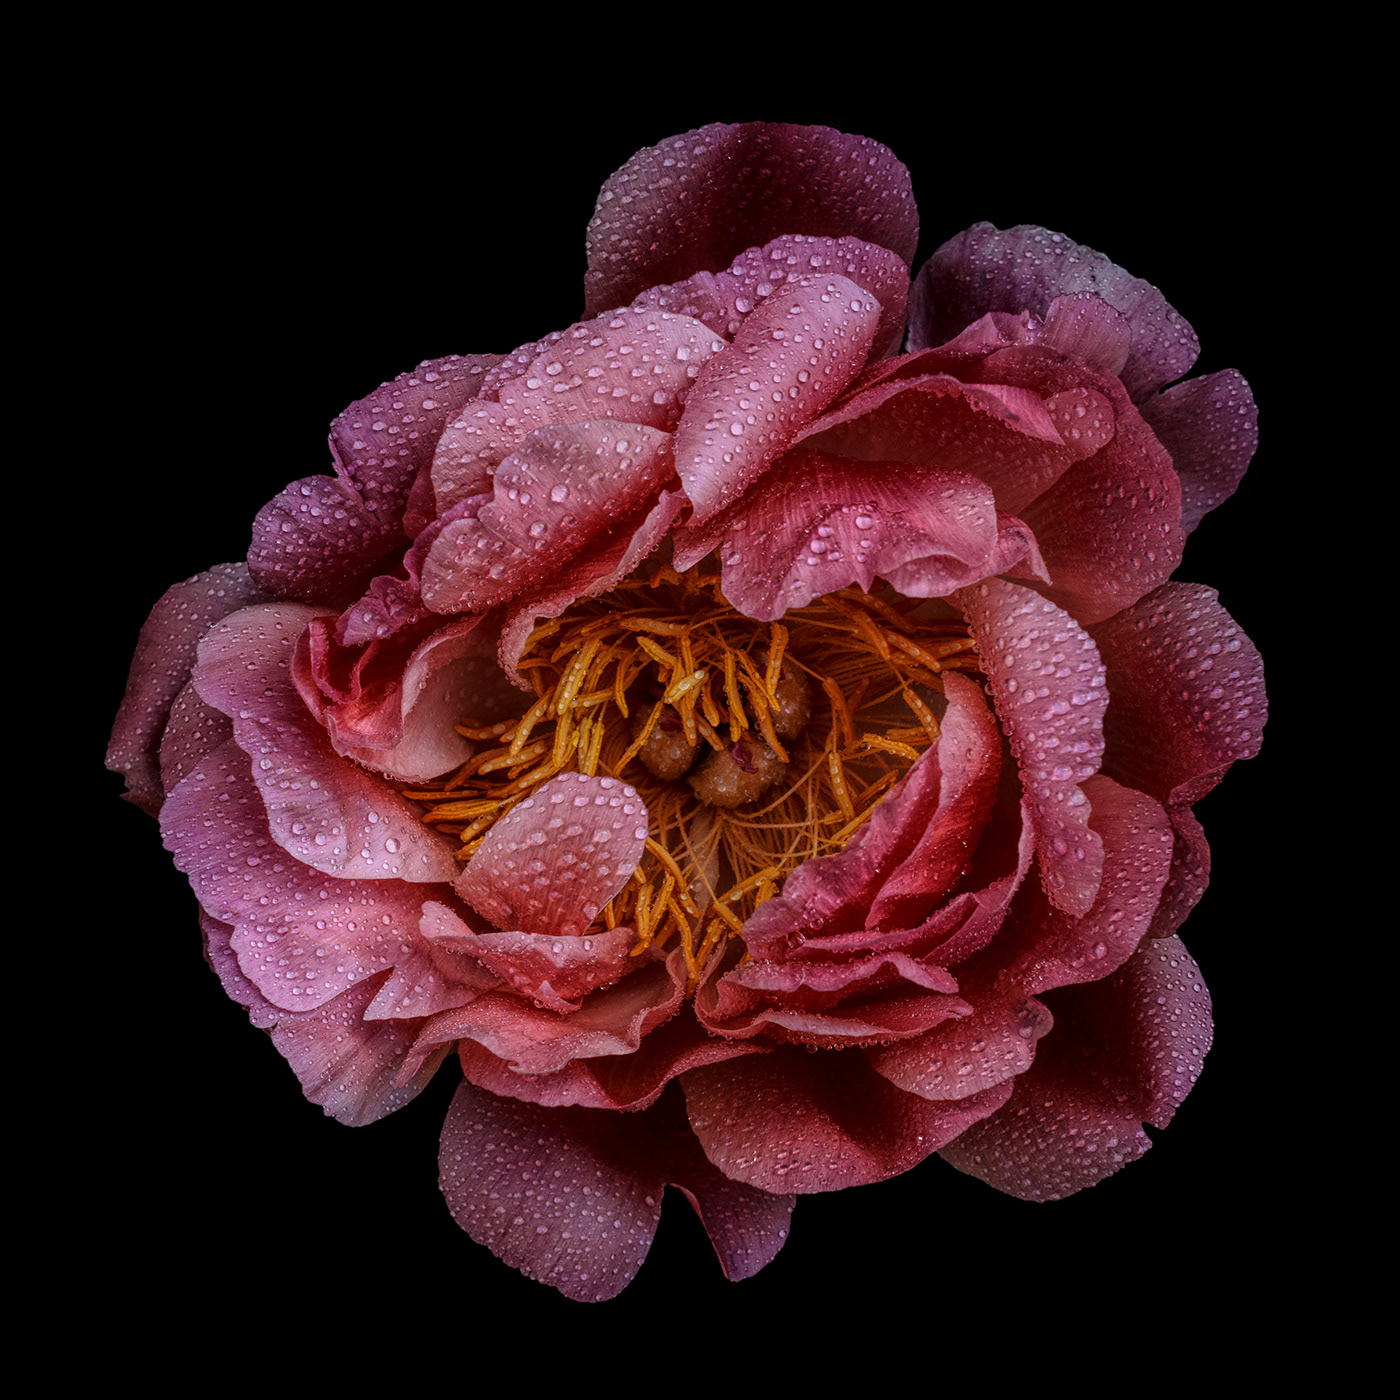 Spring Flowers / фотограф Bettina Güber